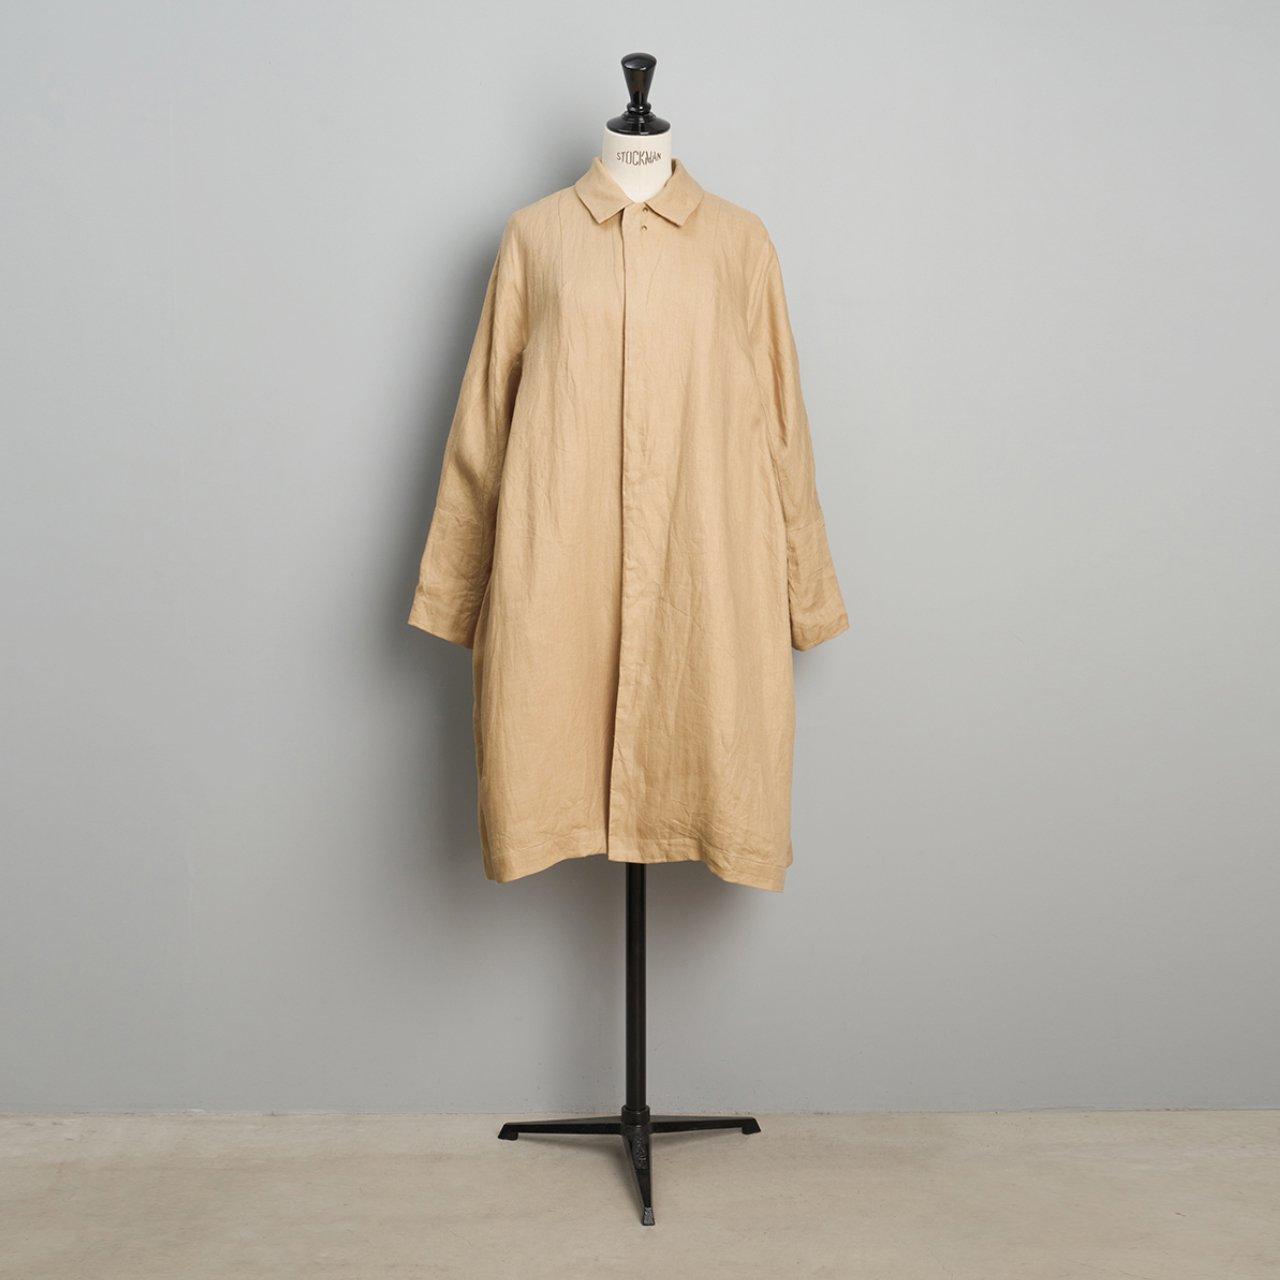 suzuki takayuki <BR>stand-fall-collar coat<BR>sand beige